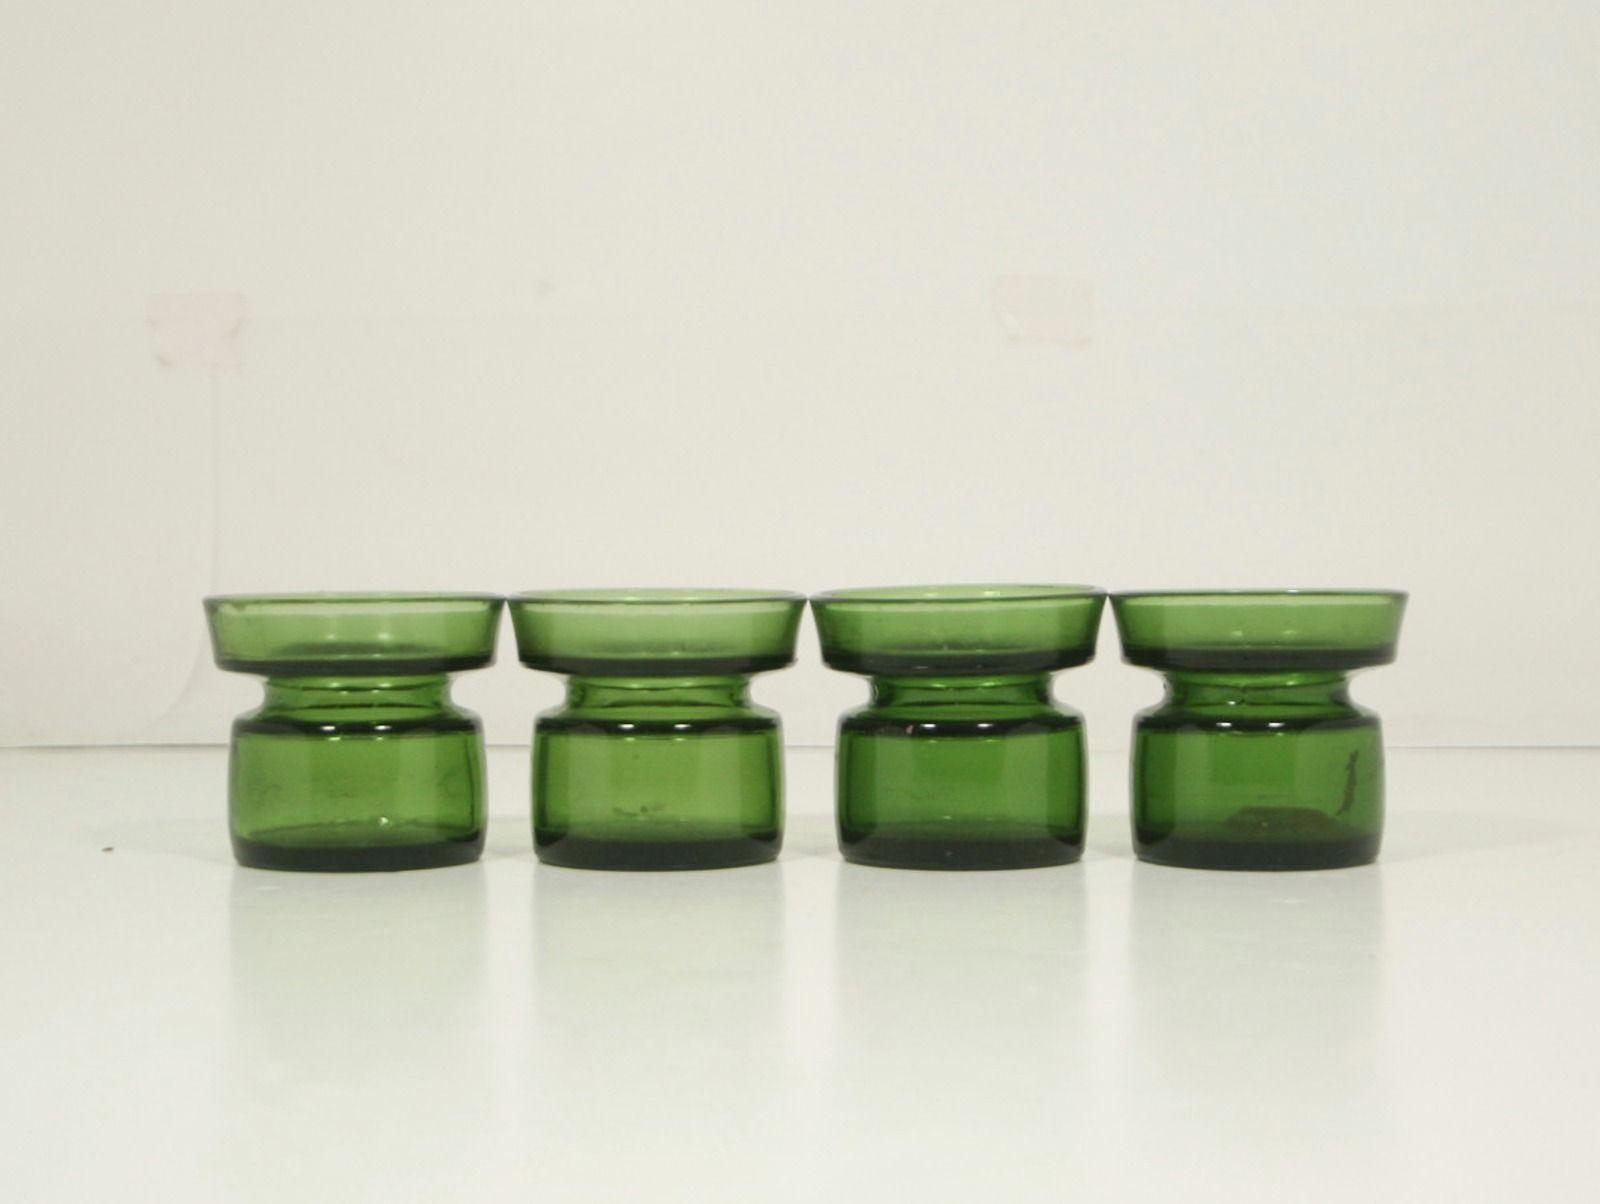 Lot of 4 Dansk Designs Ltd Green Glass Candle Holders Quistgaard - Denmark - $30.40